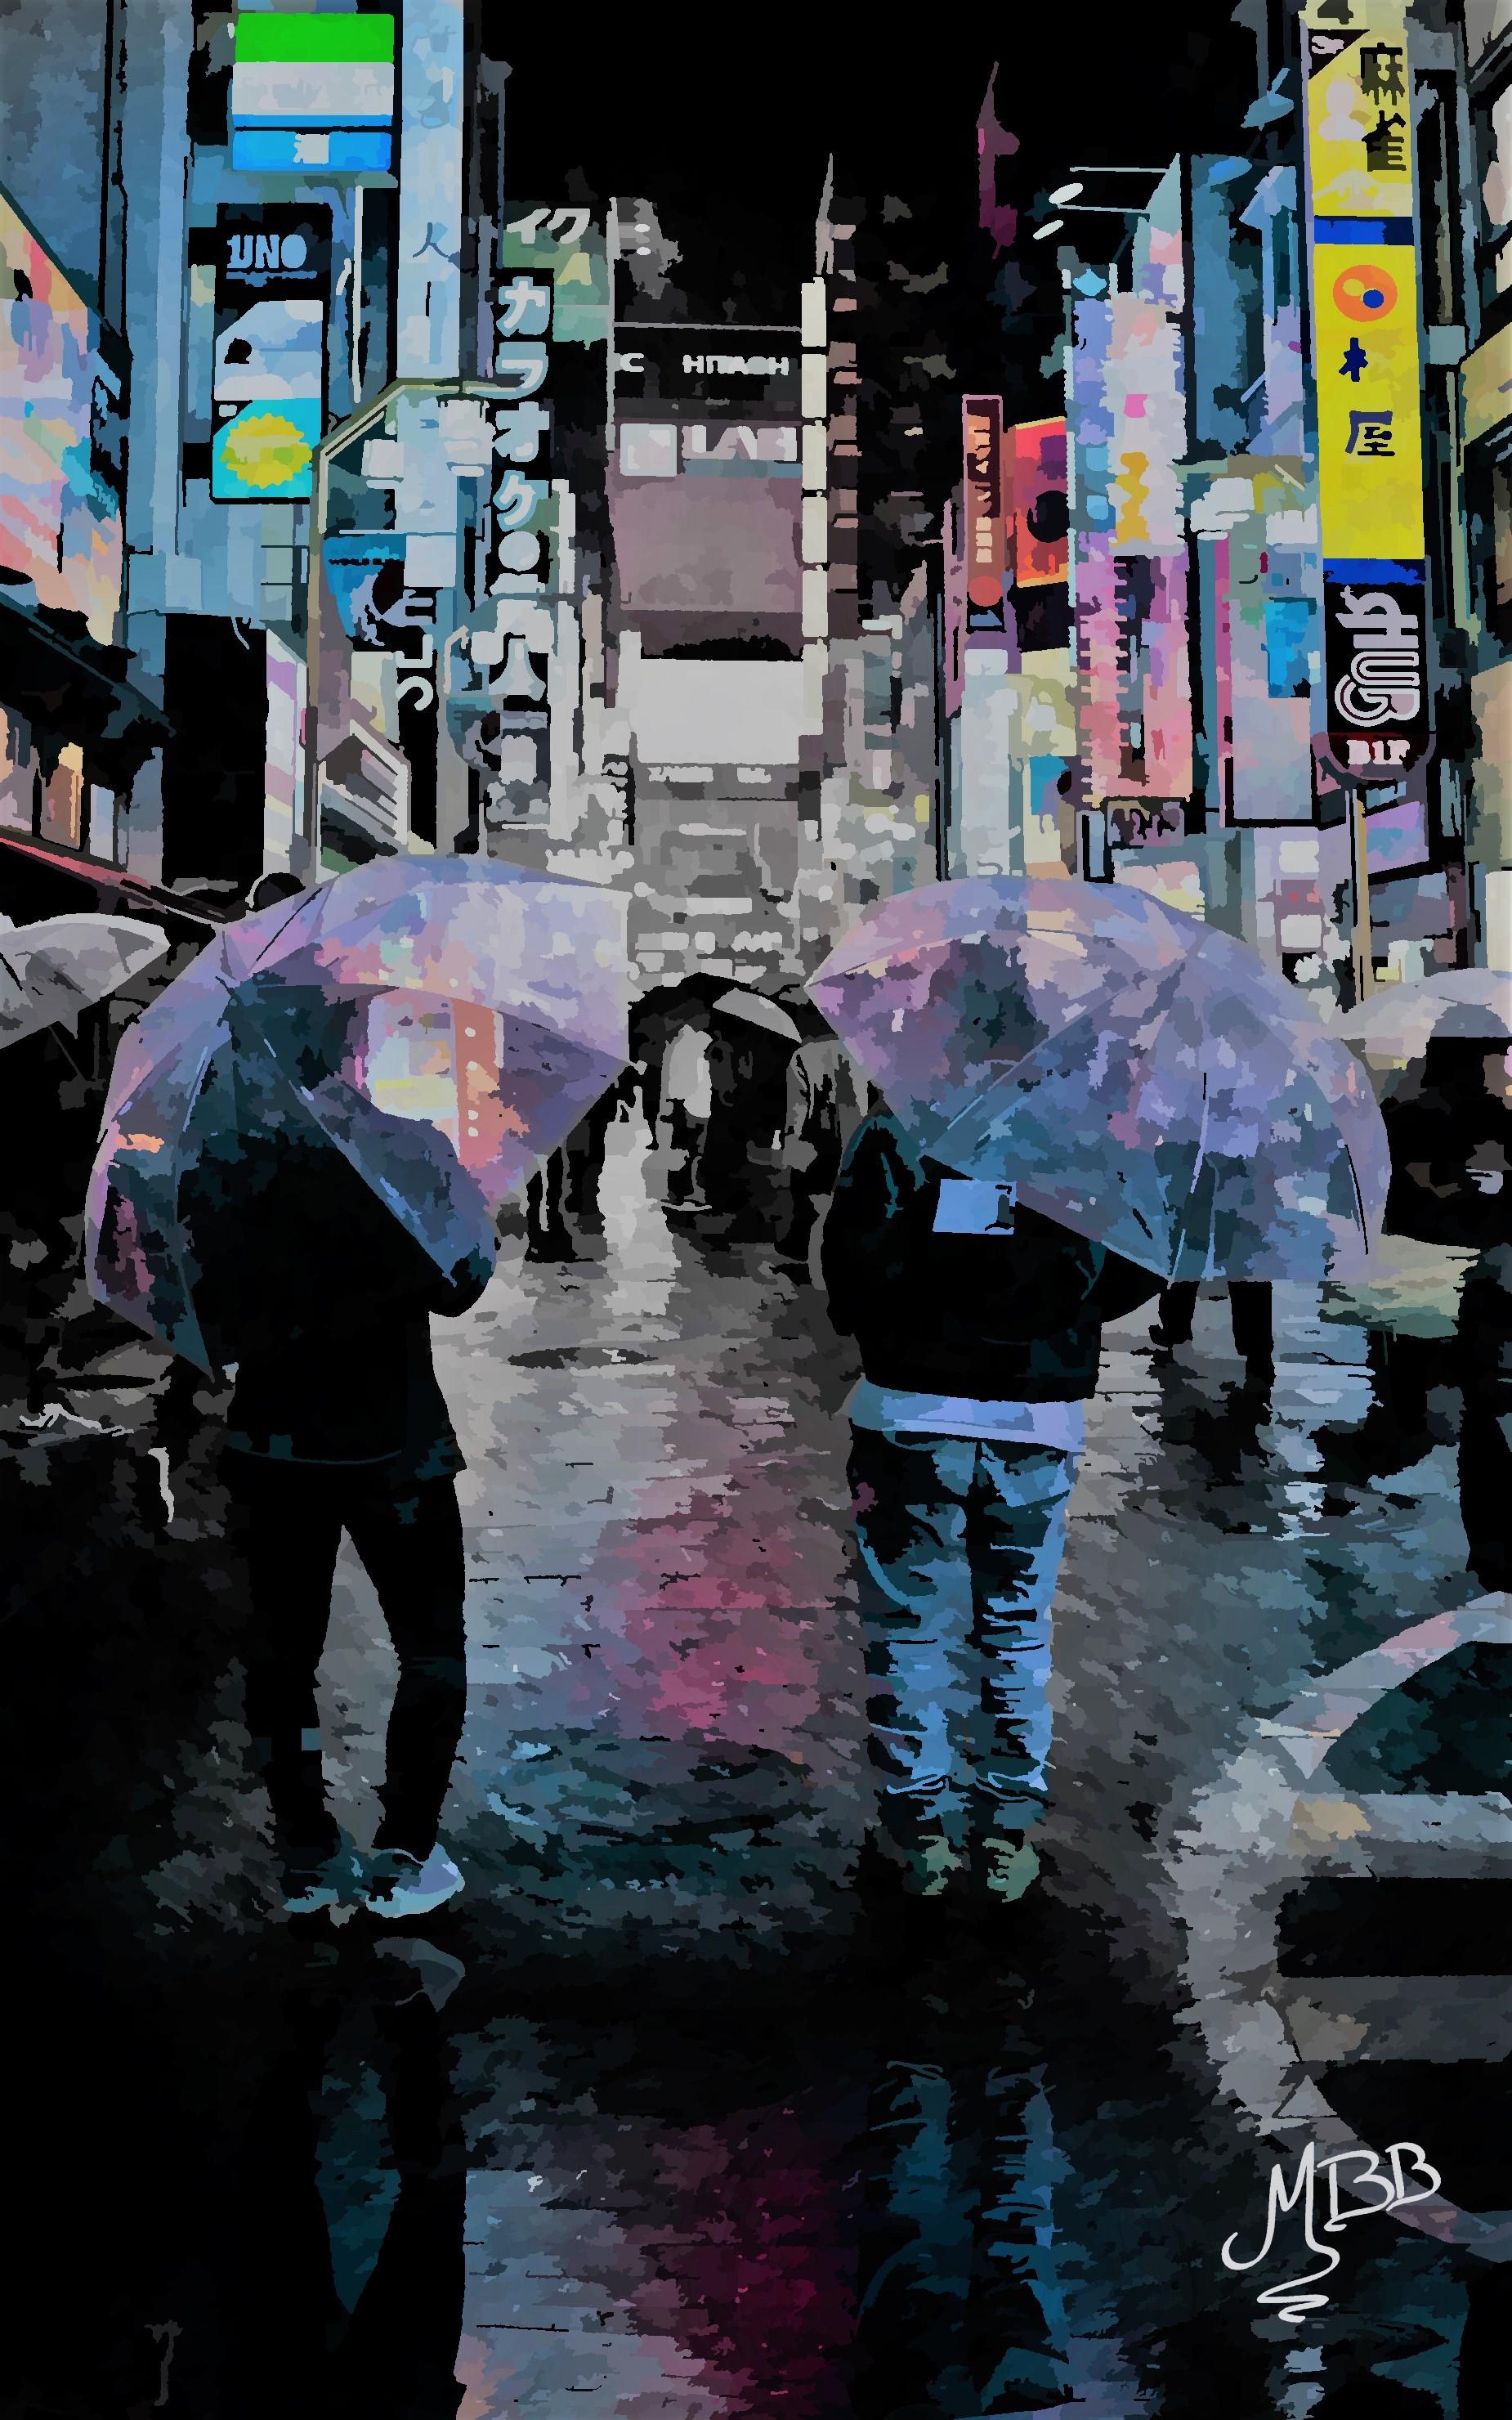 Umbrella farandole